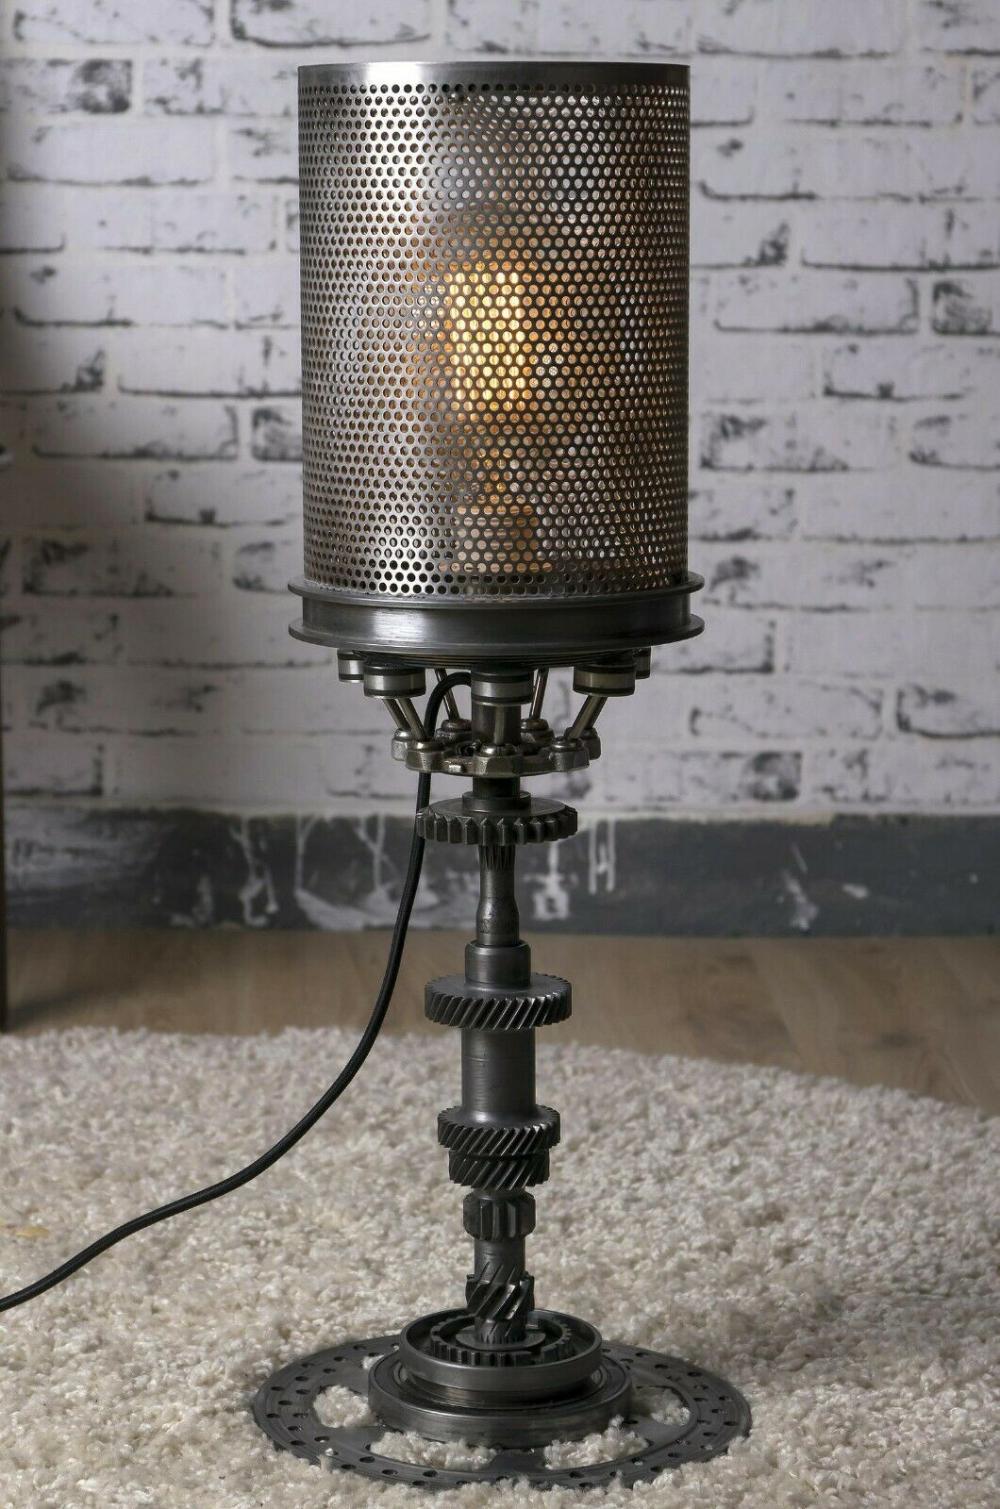 Idee Von Chueco Jorrat Auf Cervezas Industrie Stil Lampen Lampen Beleuchtung